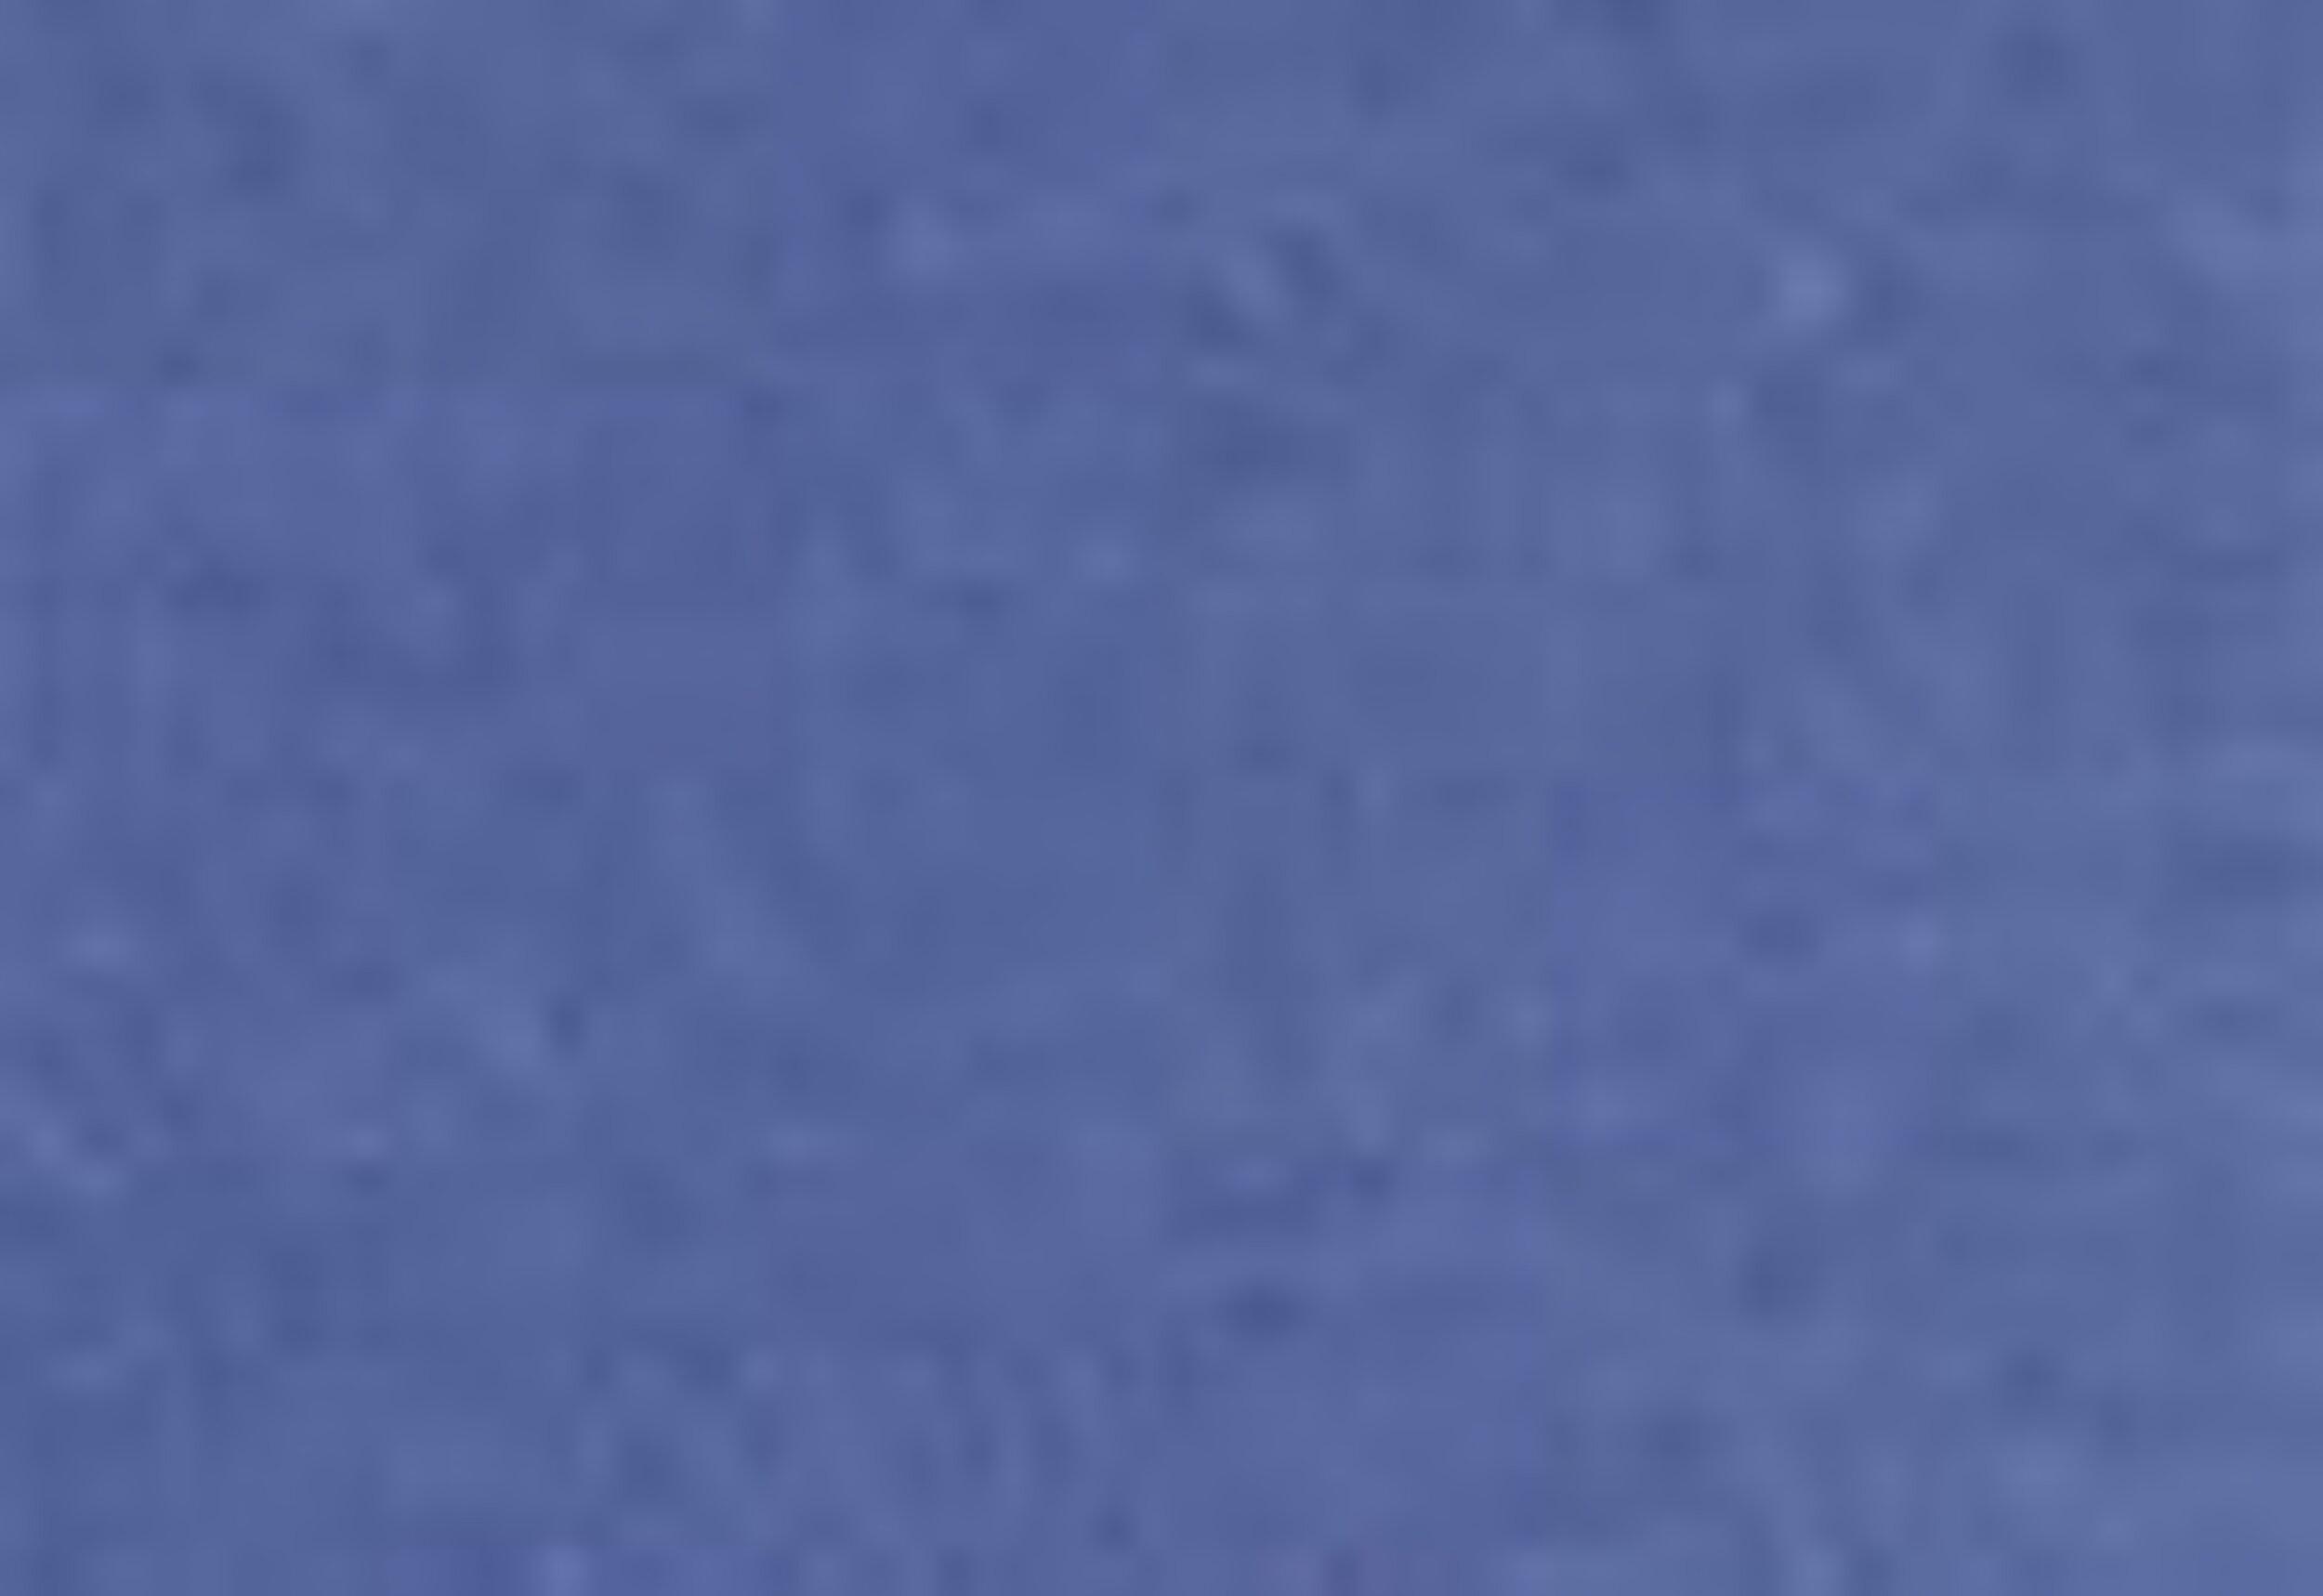 Ss Rib Baby Tee Blue Indigo Mavi Kadın Tişört